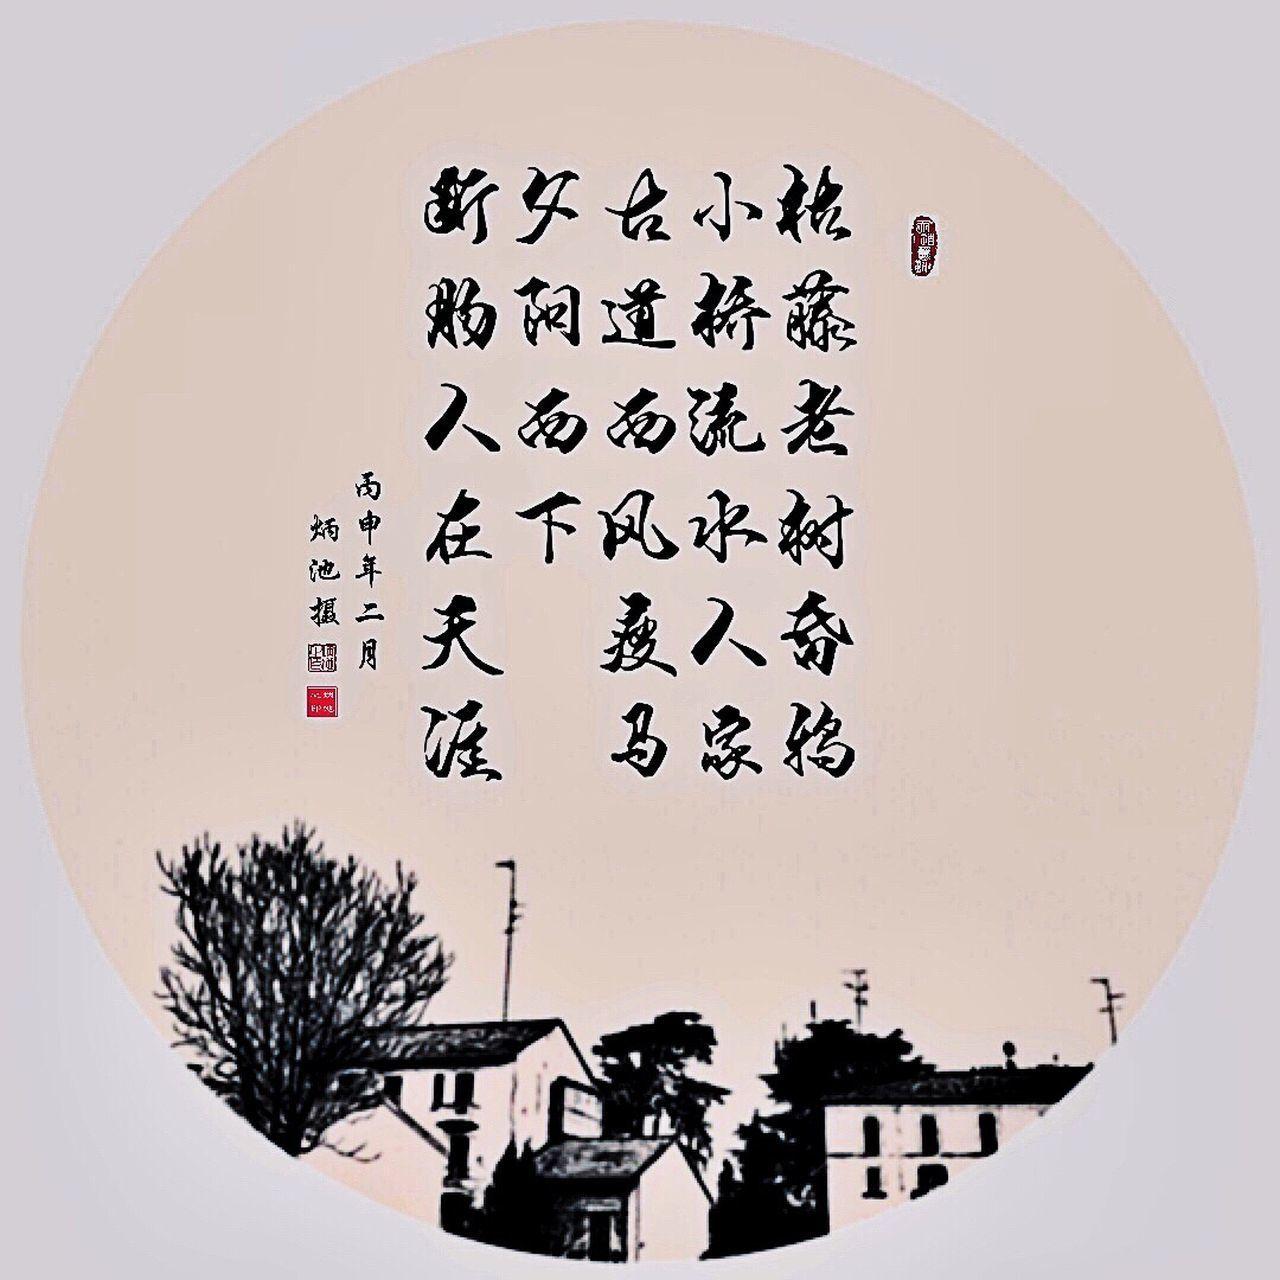 The Traditional Chinese Painting Chinese Style Building Chinese Style 国画 EyeEm Best Shots First Eyeem Photo Photooftheday Photoshoot Photo Photography EyeEm EyeEm Gallery